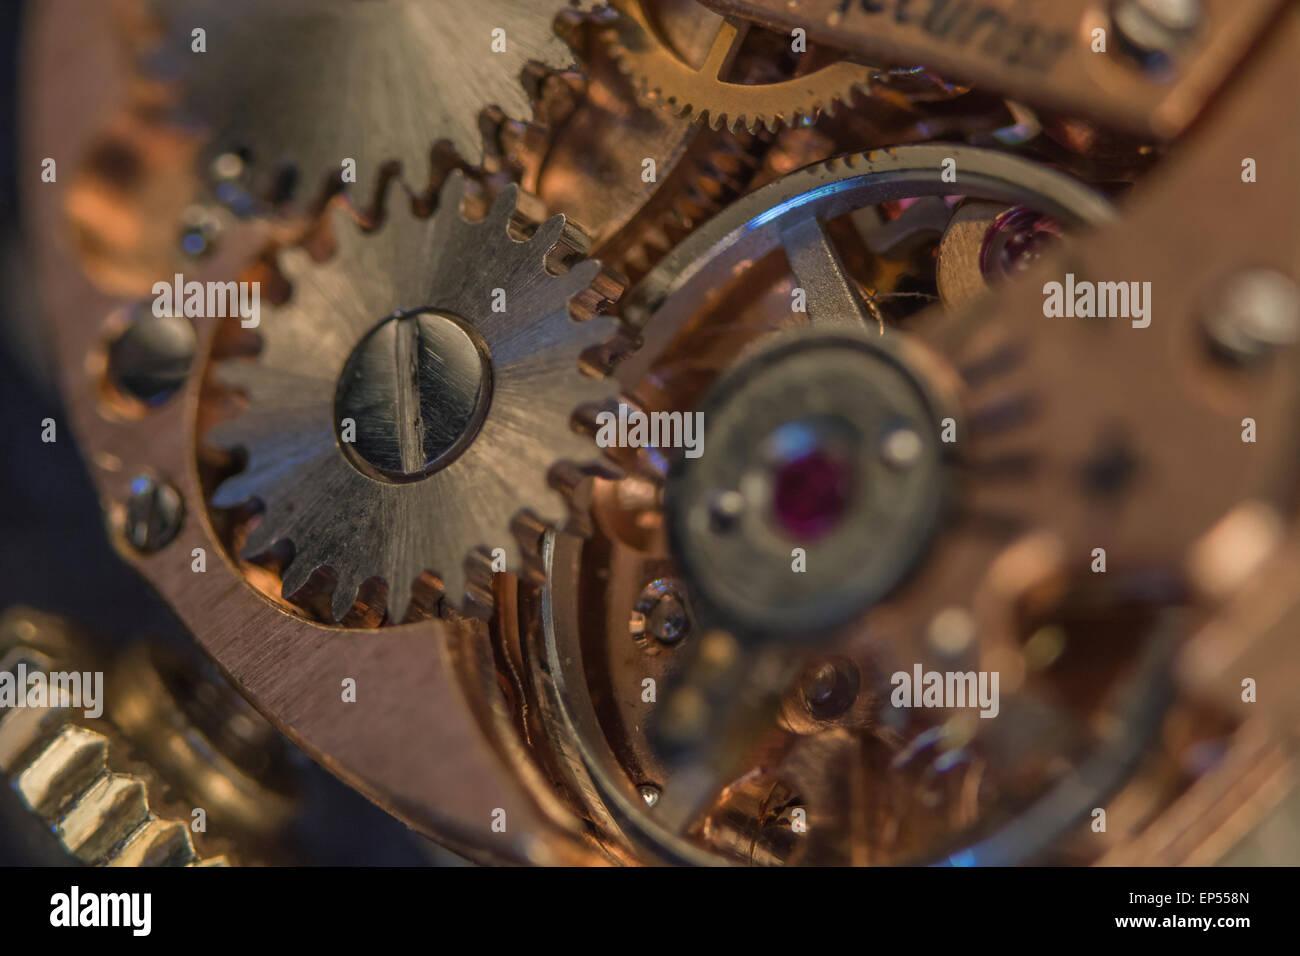 Macro-photo of wristwatch mechanism. Key focus on upper right hand teeth of steel cog to left half of picture. - Stock Image